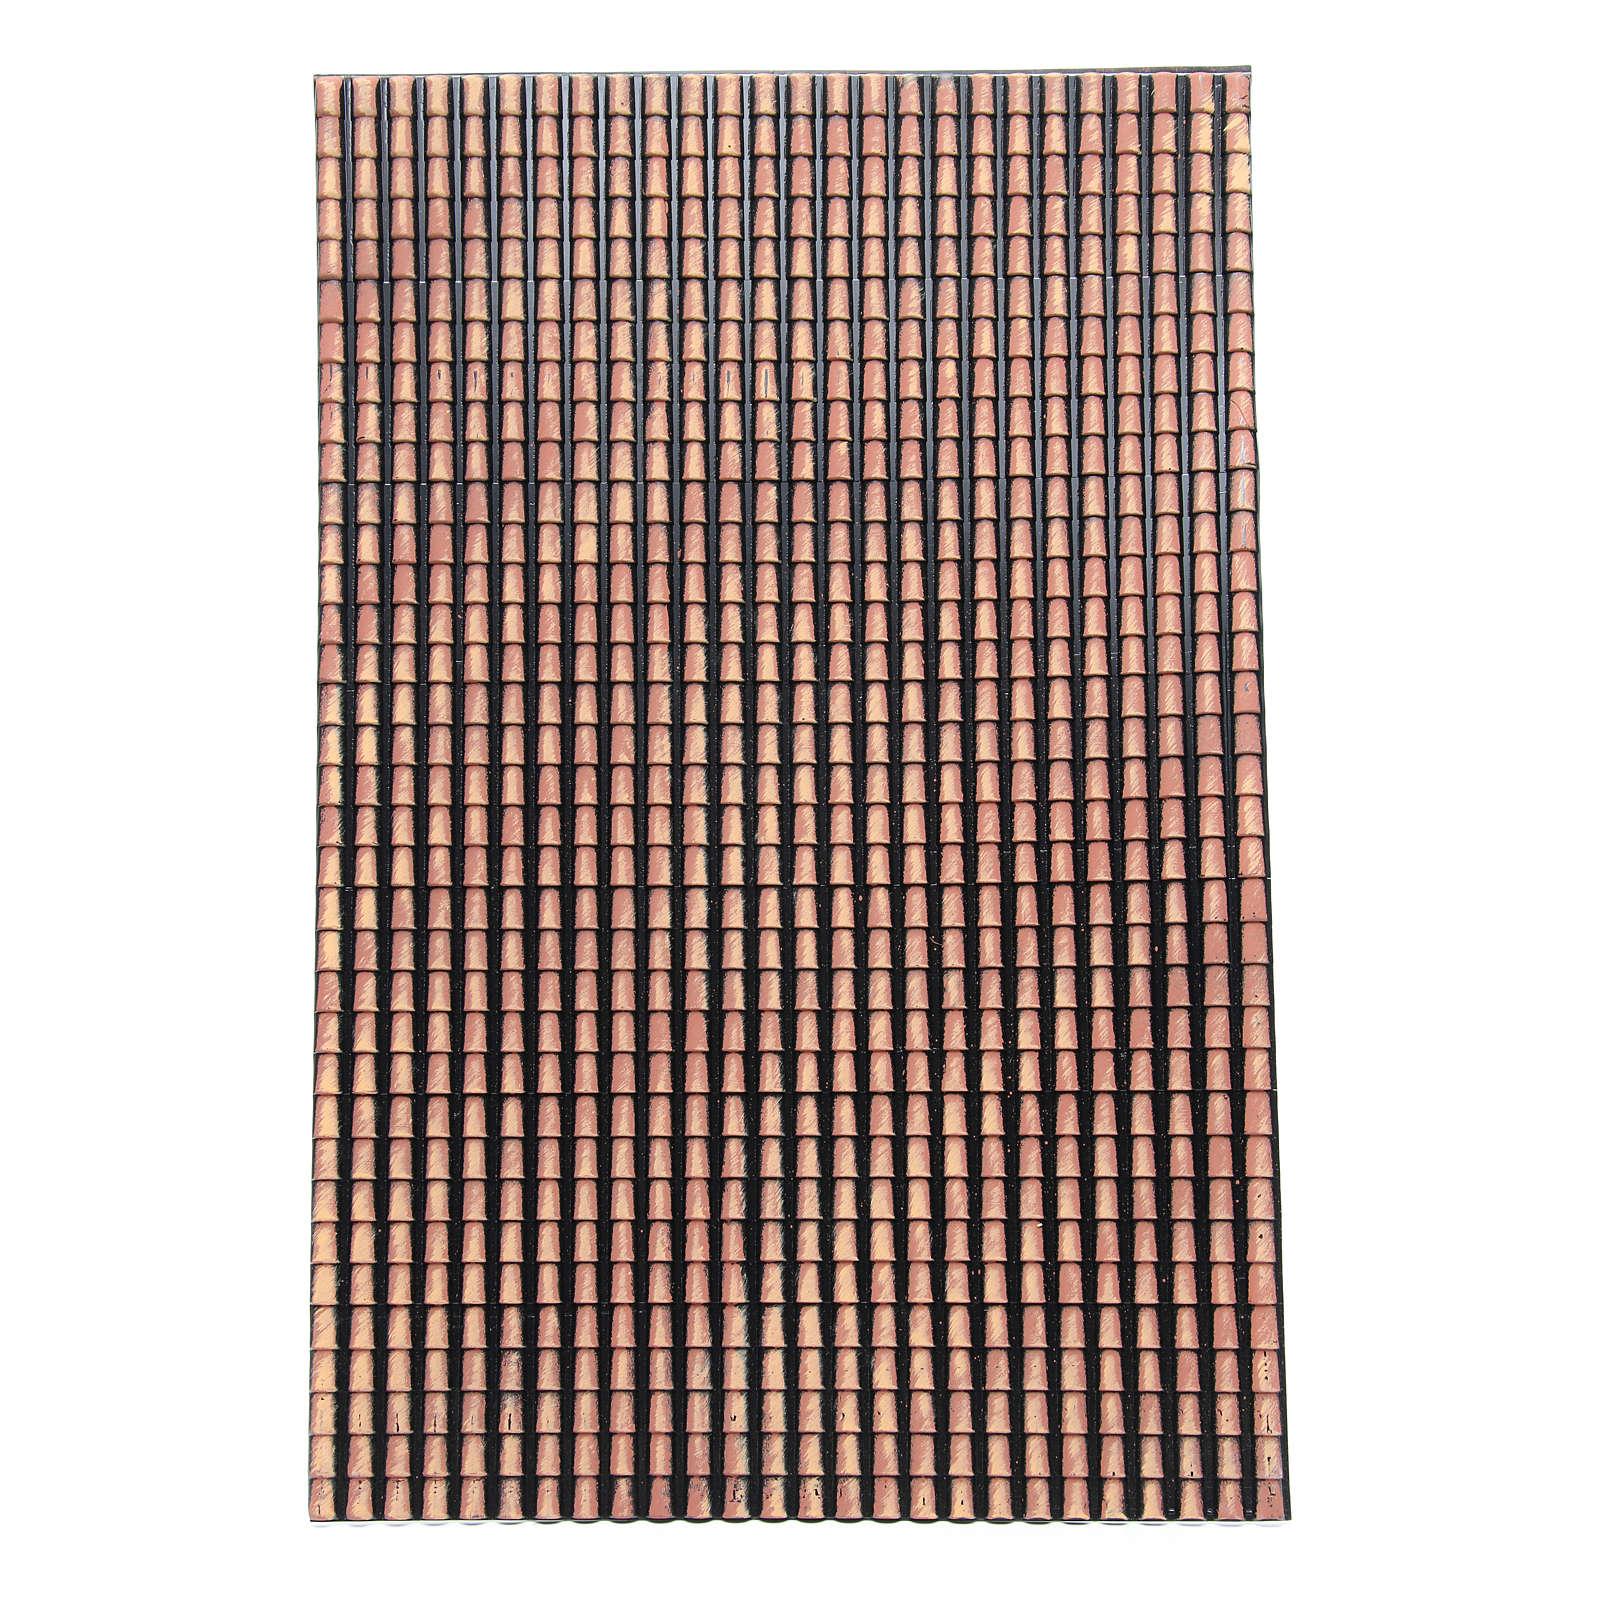 Tetto presepe pannello tegole rosse sfumate 70x50 cm 4